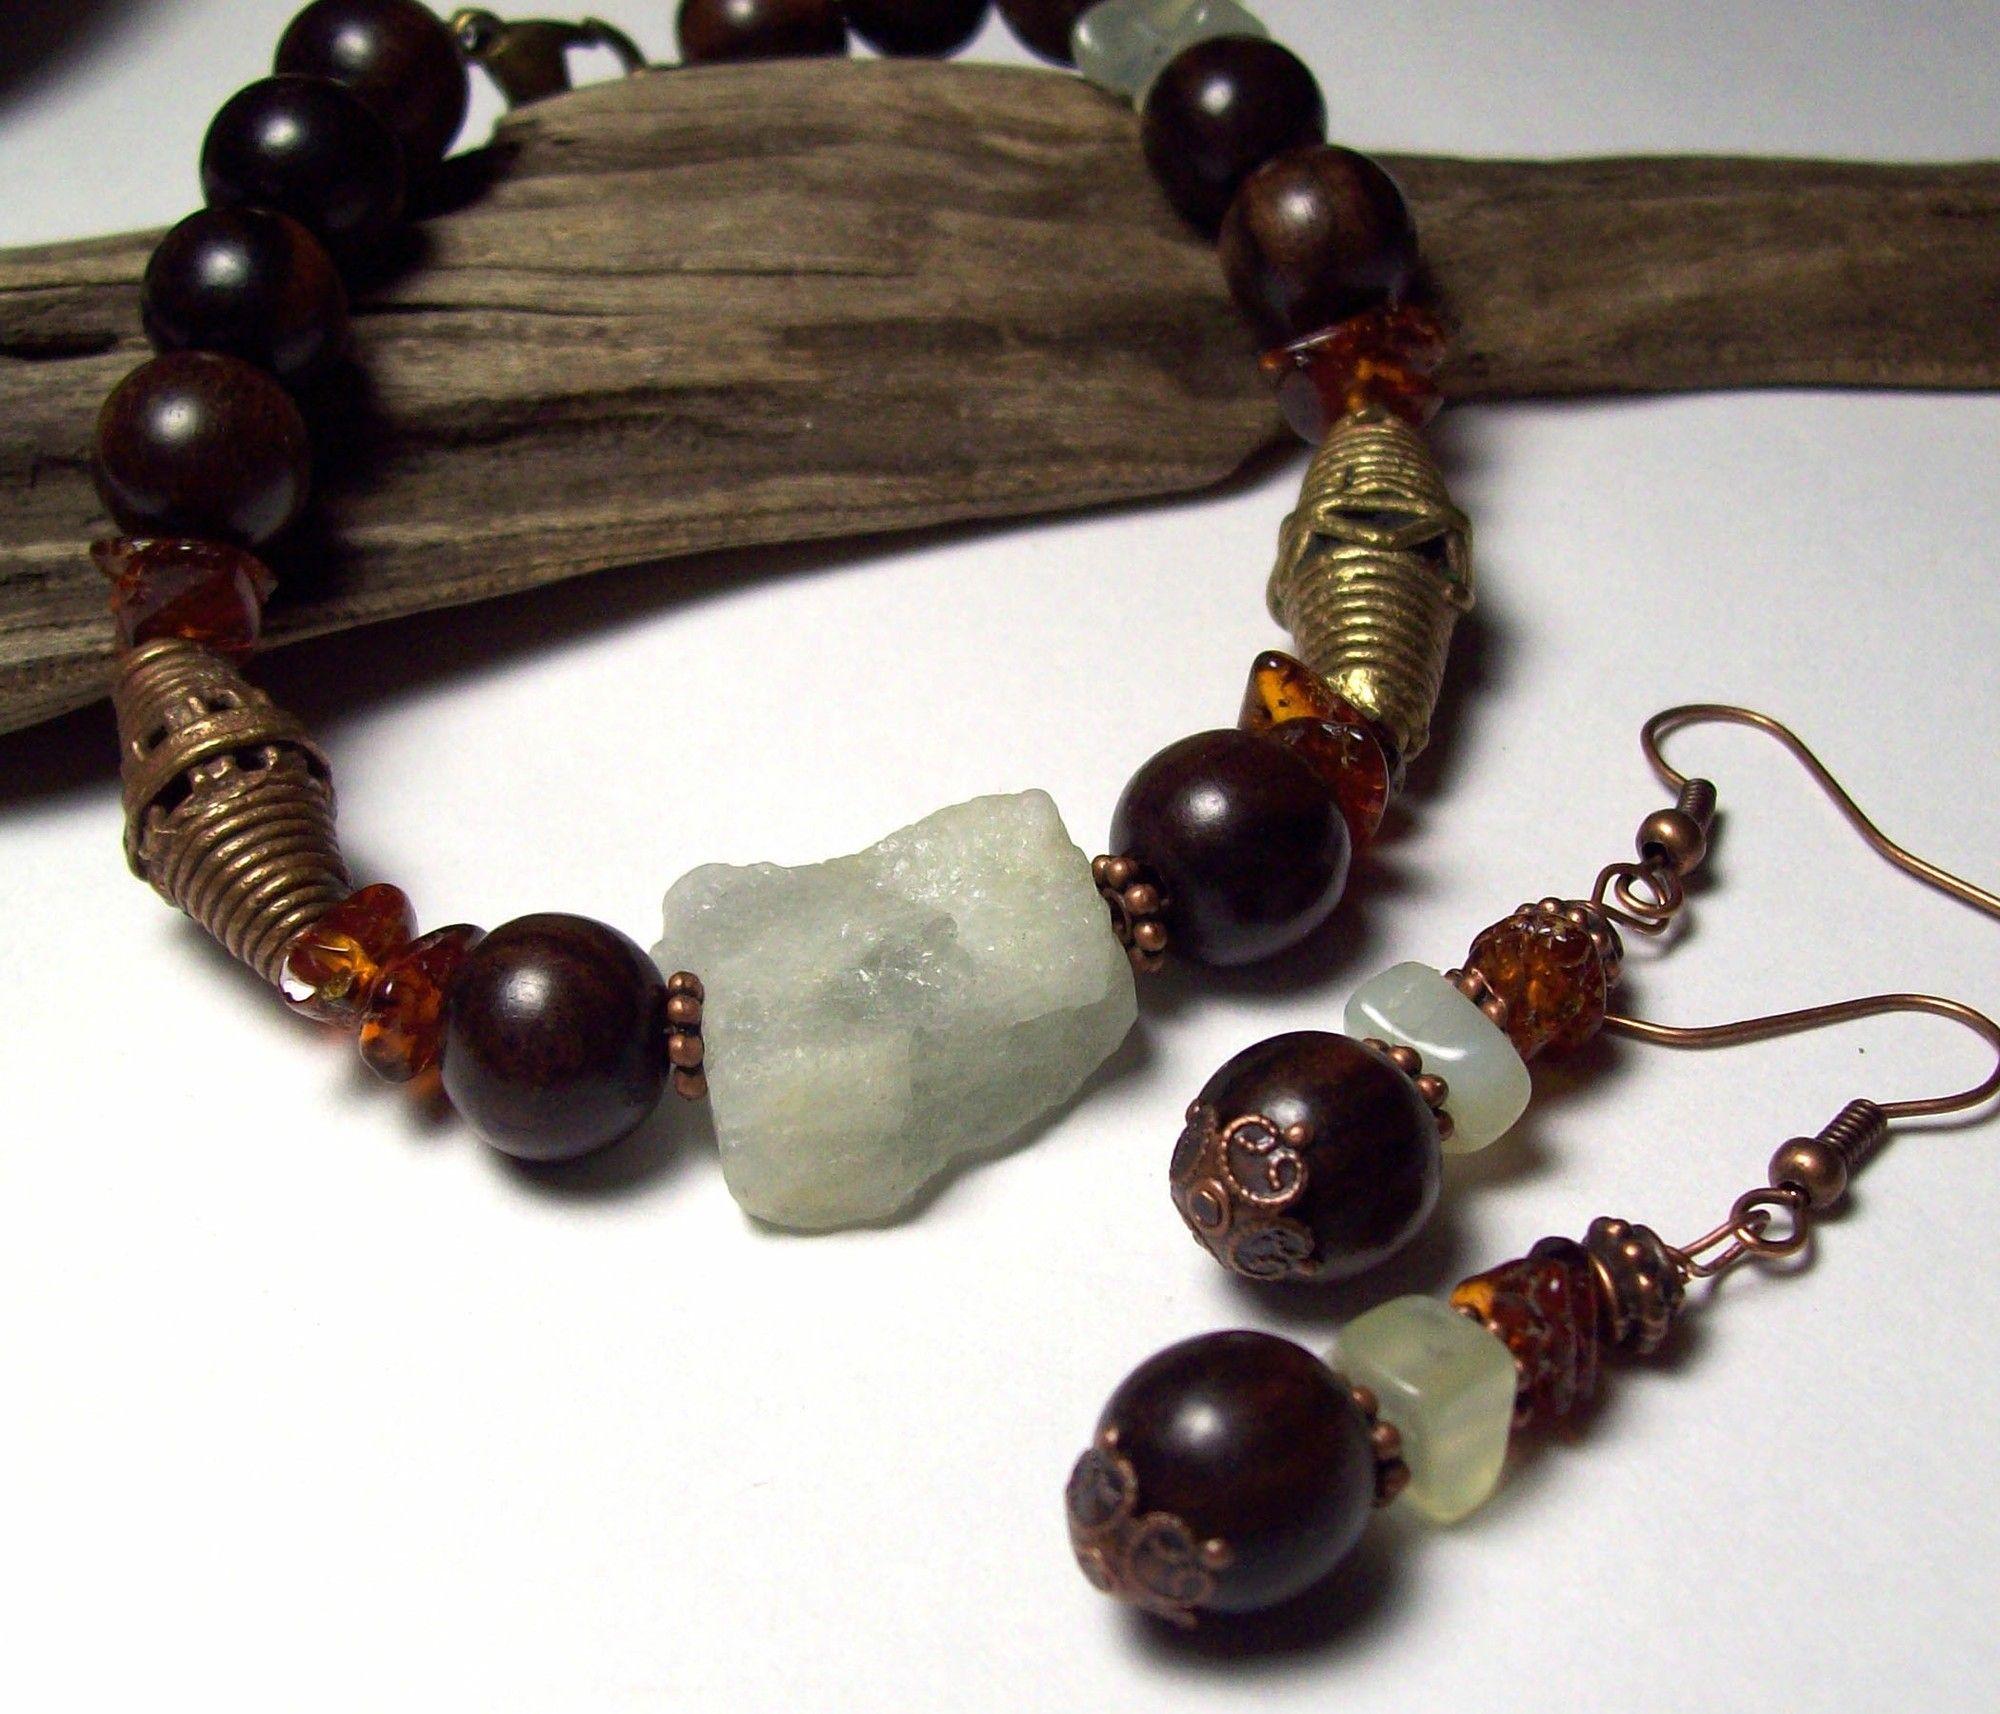 riverpebble stonewear ~ handmade jewelry - TAIFA- Tiger Ebony, Aquamarine and Trade Bead Bracelet and Earring set